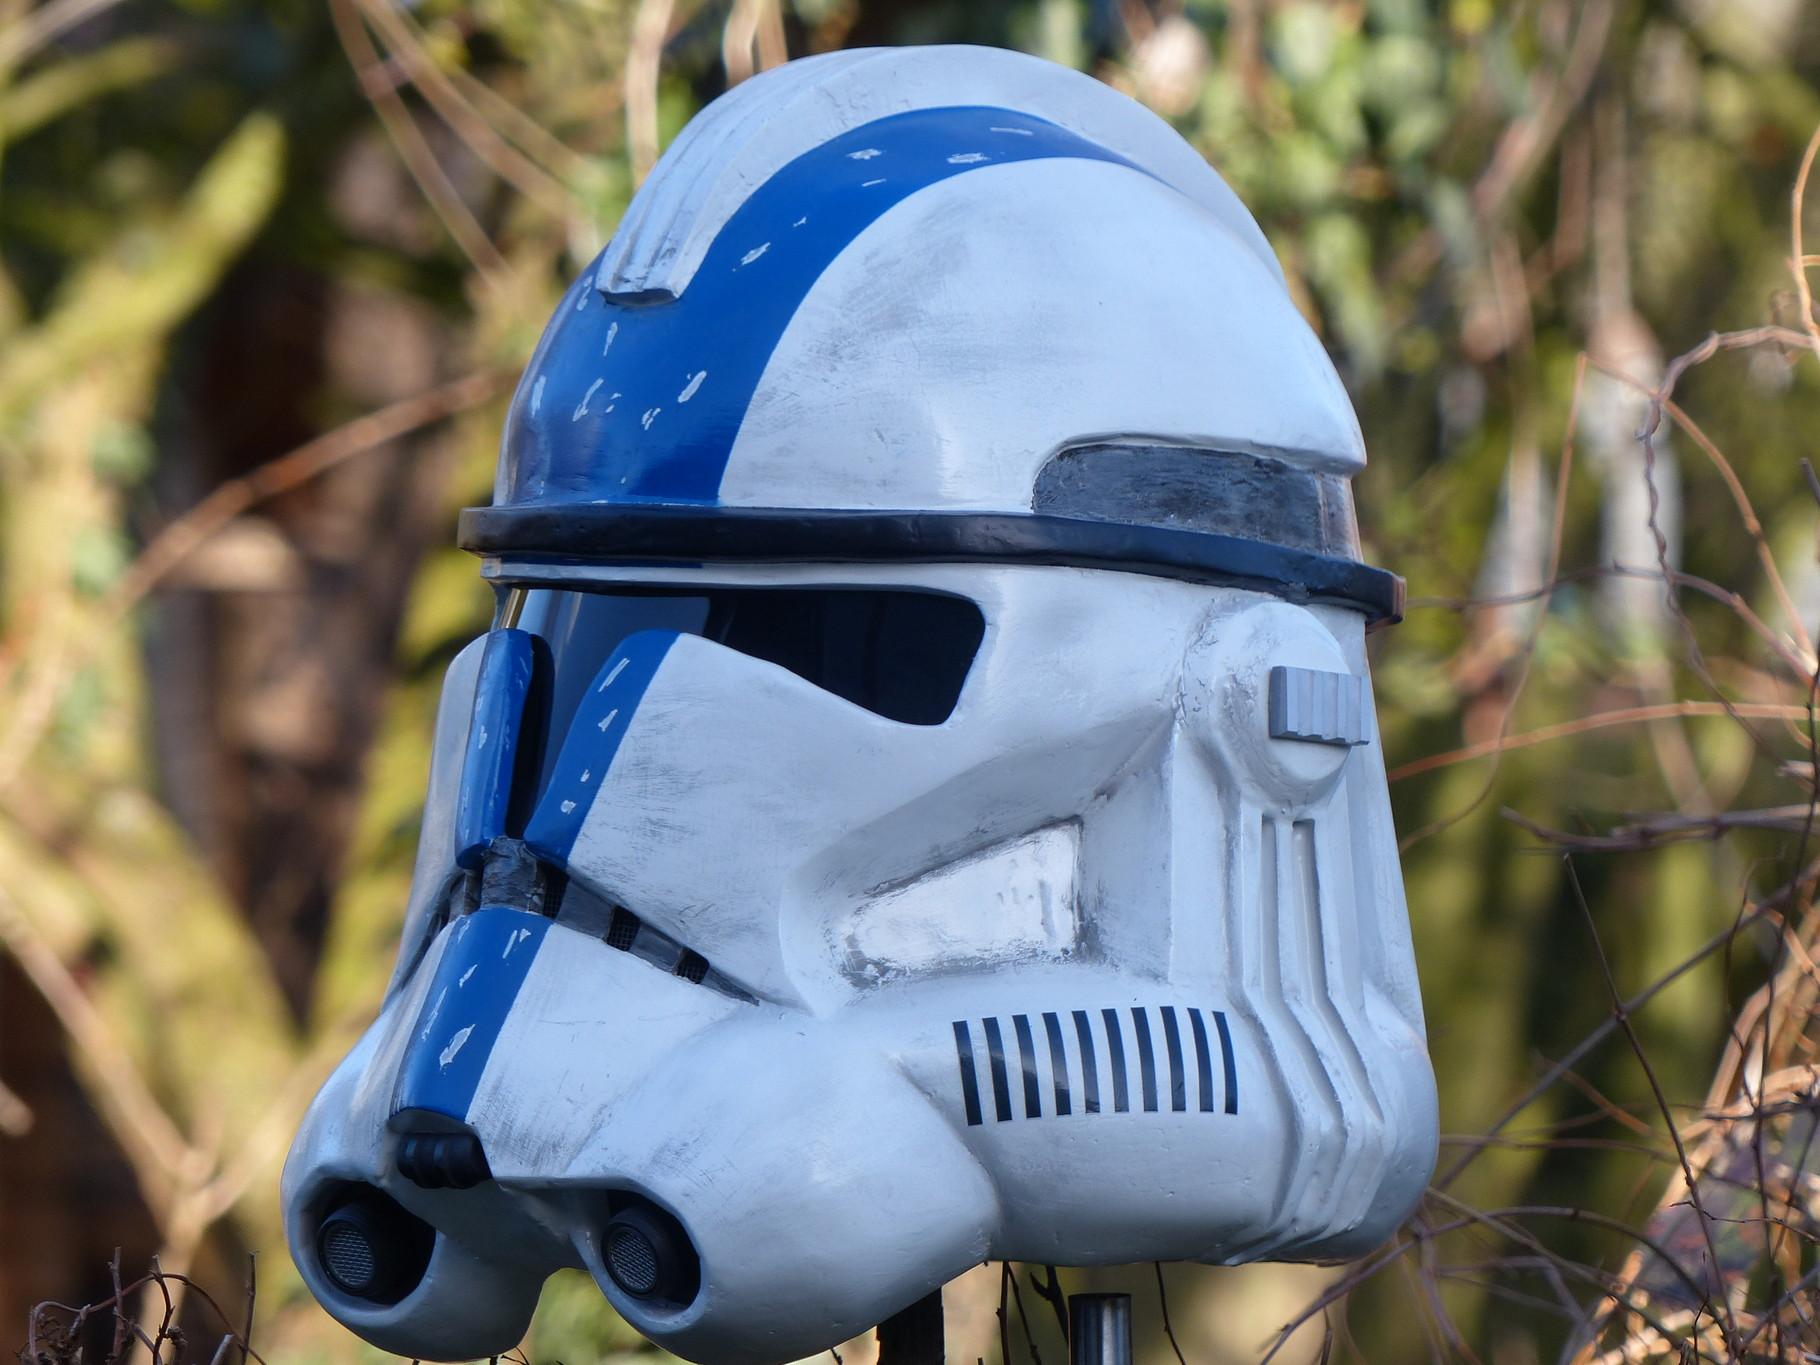 Star Wars Helme selber Bauen - star wars Helme selber bauen